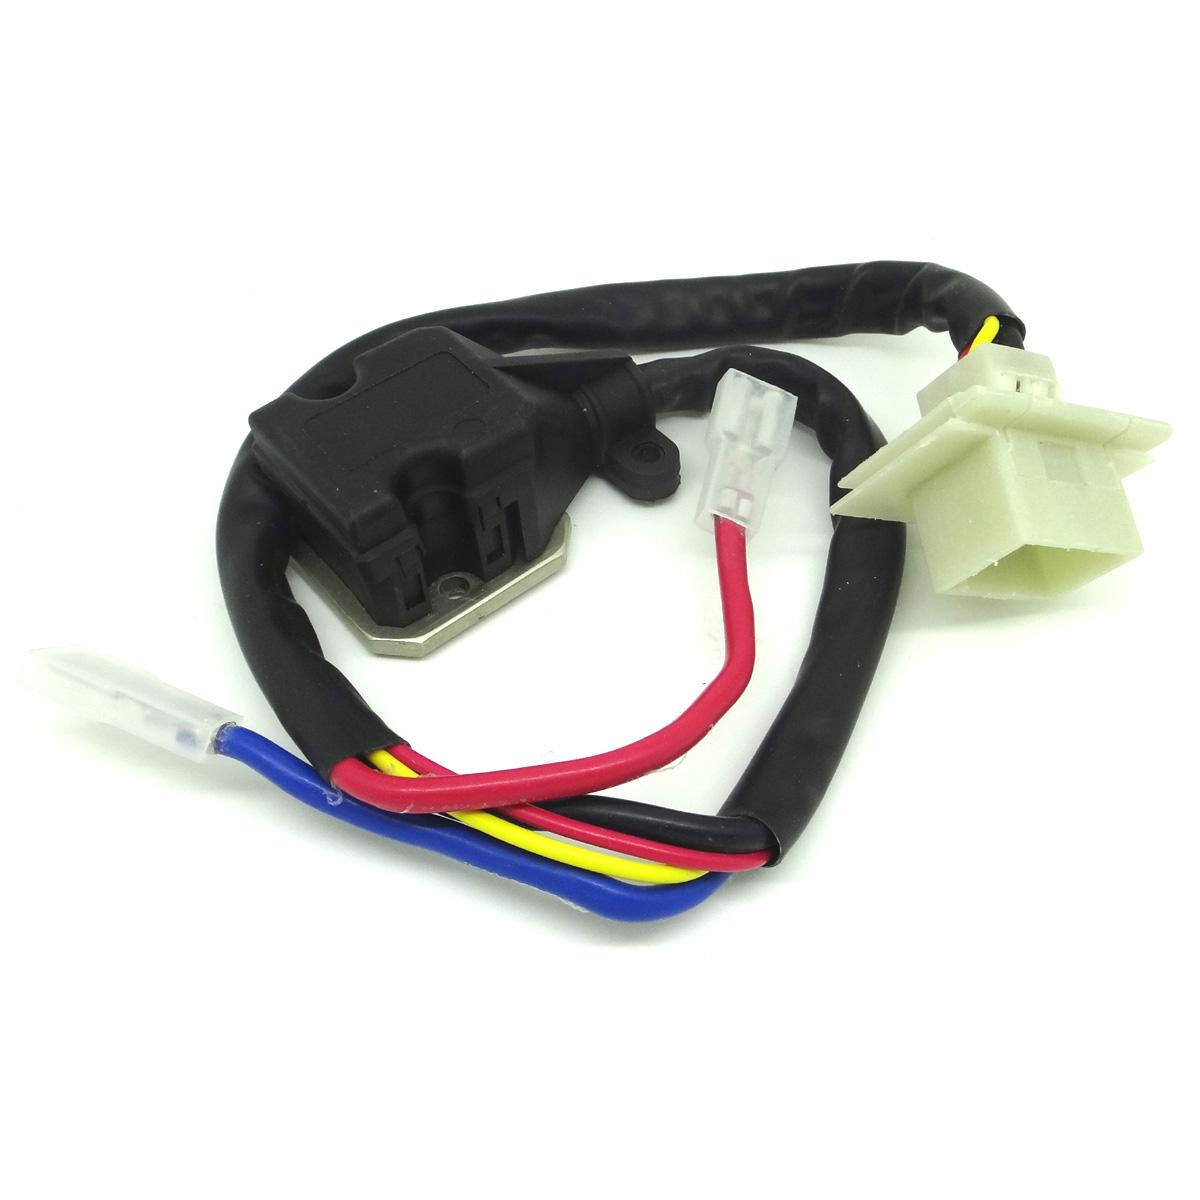 Blower Motor Resistor Regulator For Mercedes-Benz E300 E320 Parts 2108218351